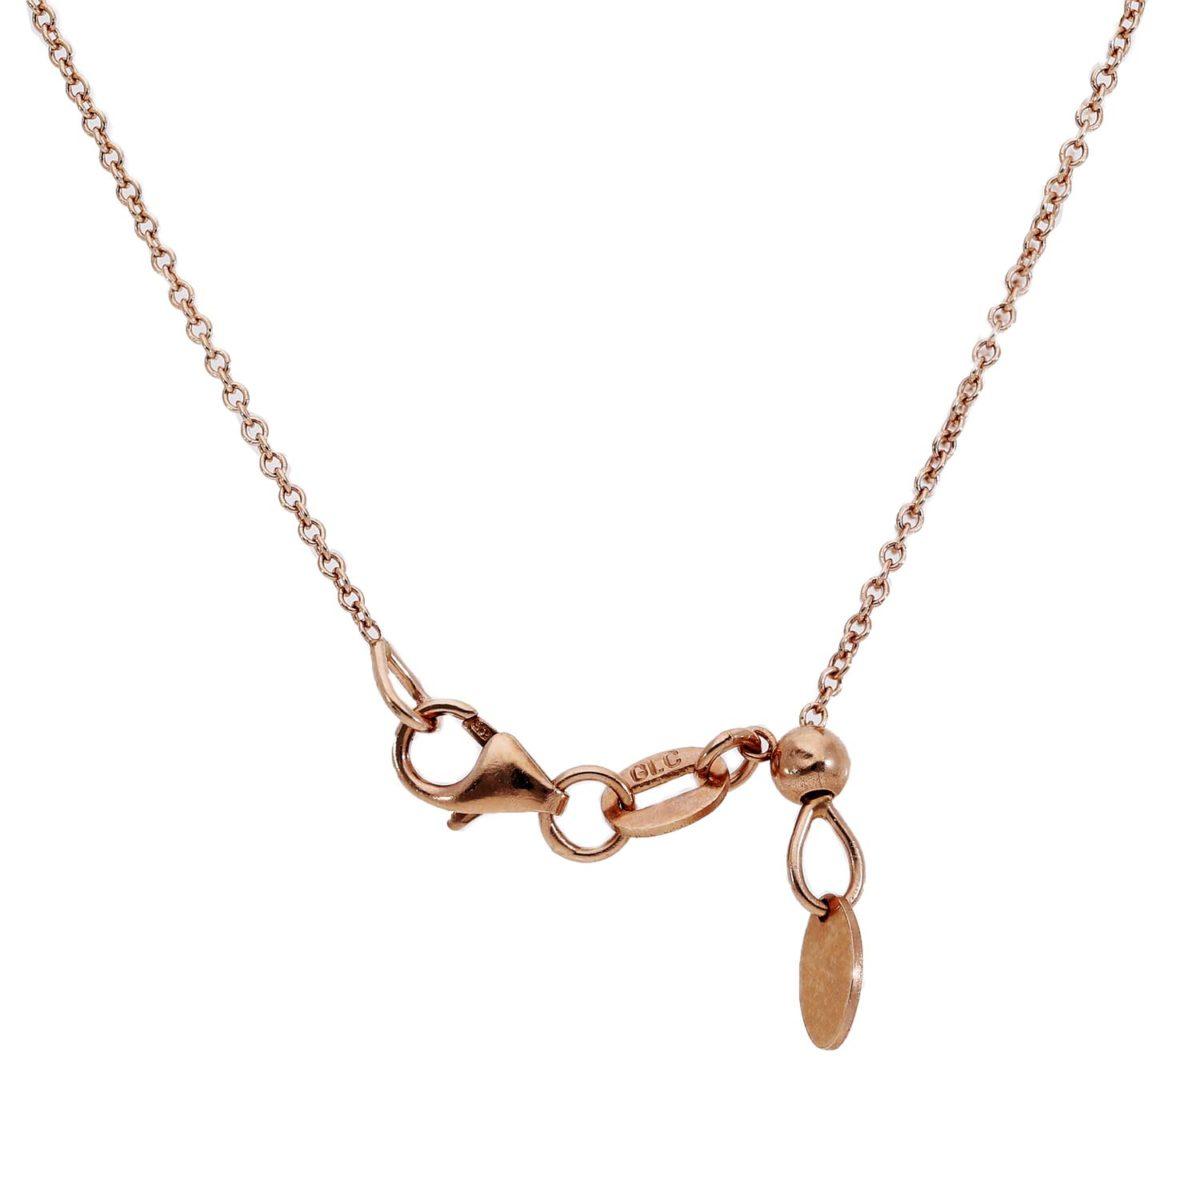 Diamond NecklaceStyle #: MK-840861